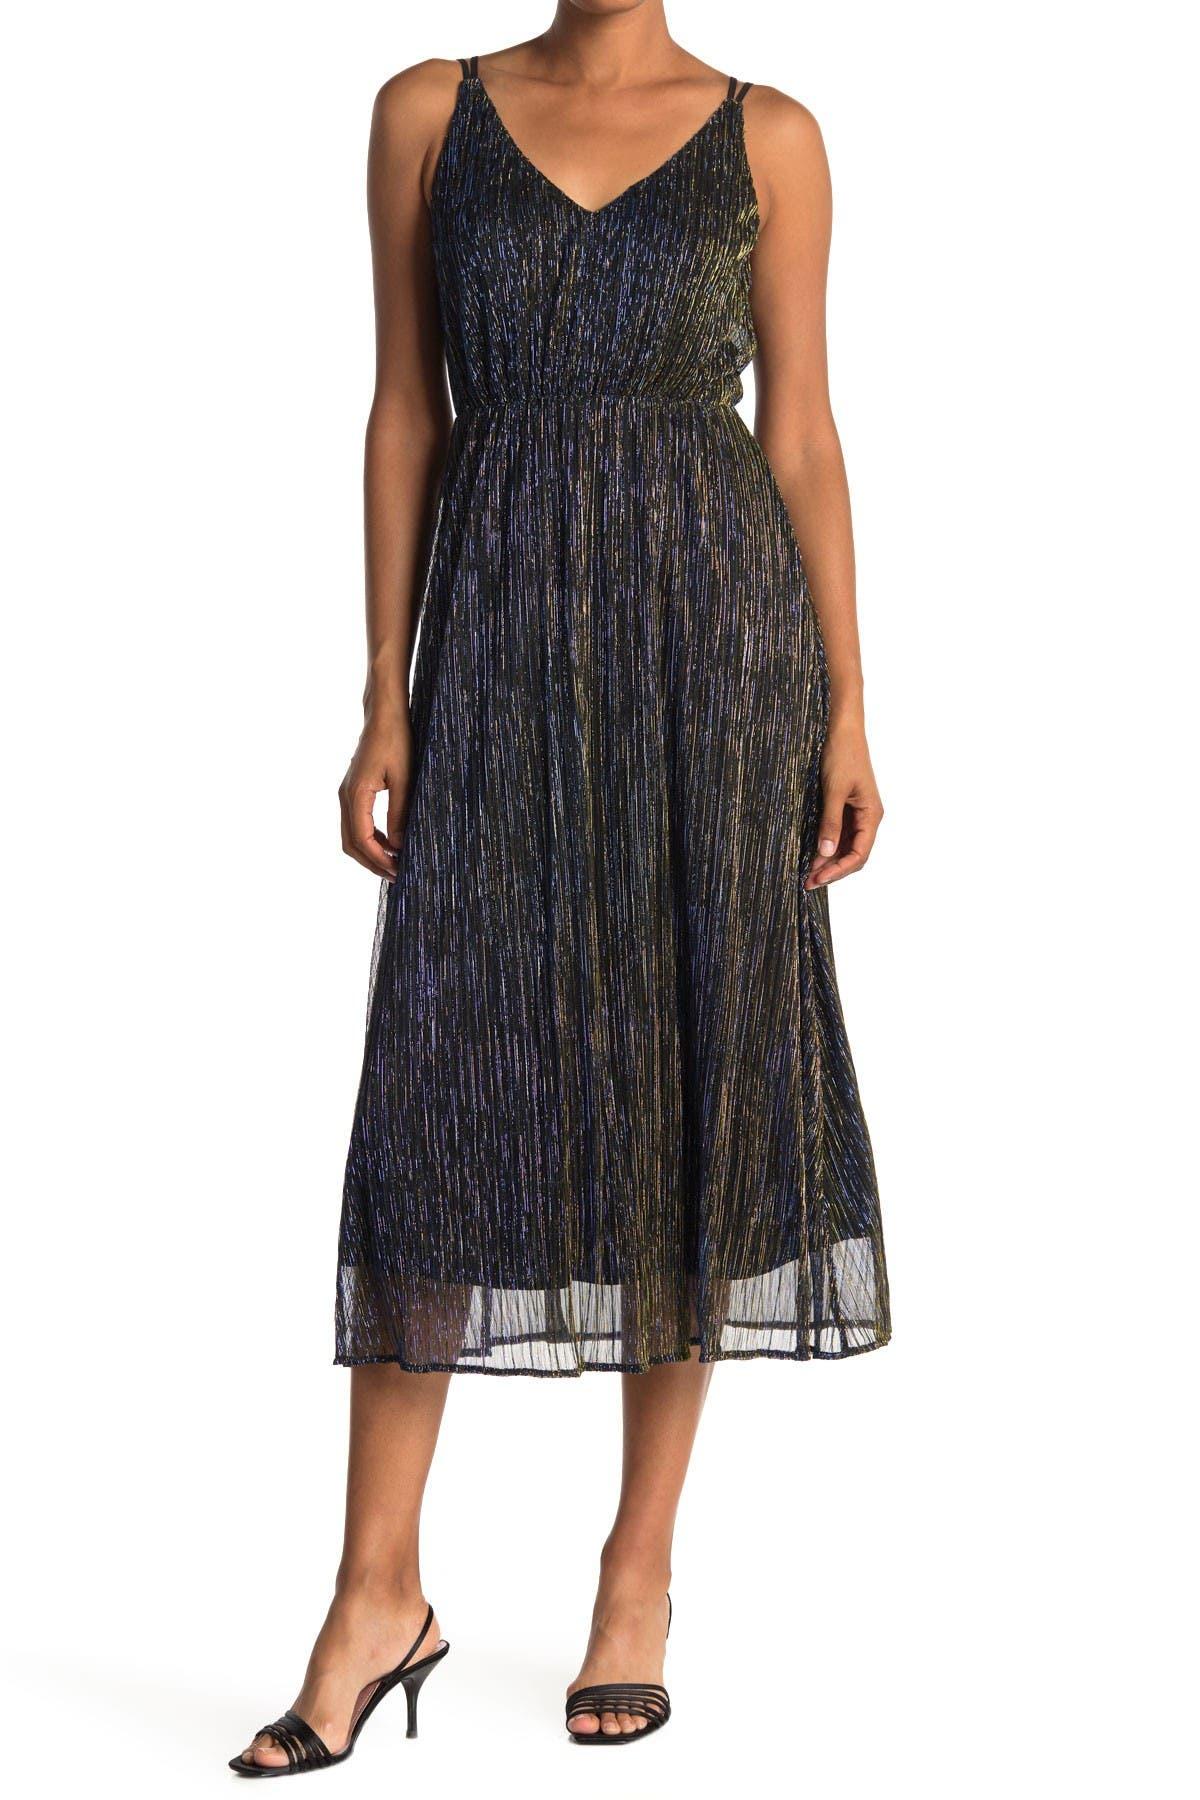 Image of Sam Edelman Metallic Plisse Midi Dress